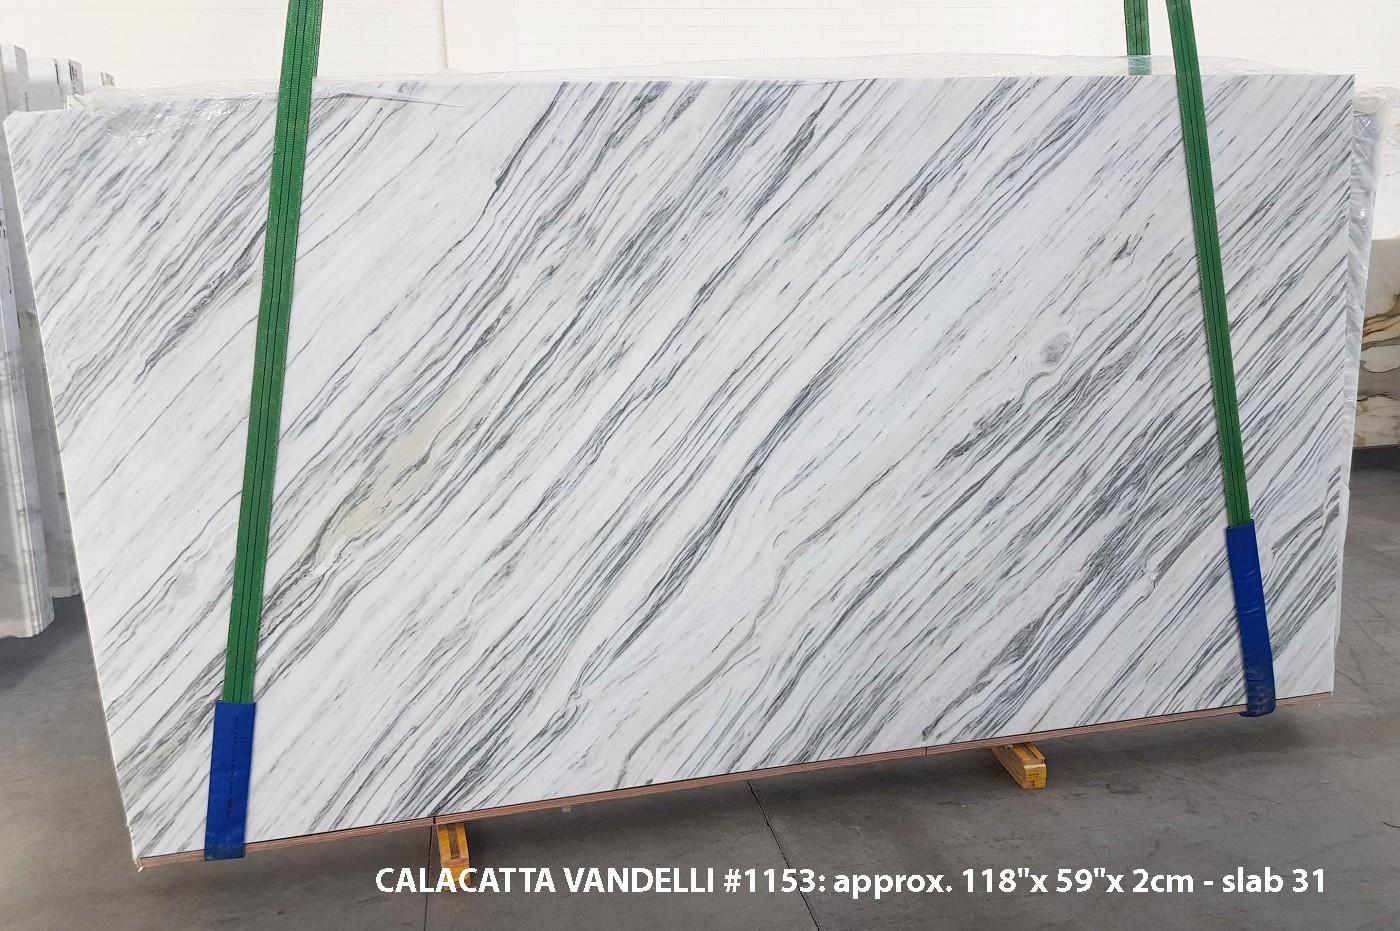 Calacatta Vandelli polished slabs 1153 , Slab #31 natural marble